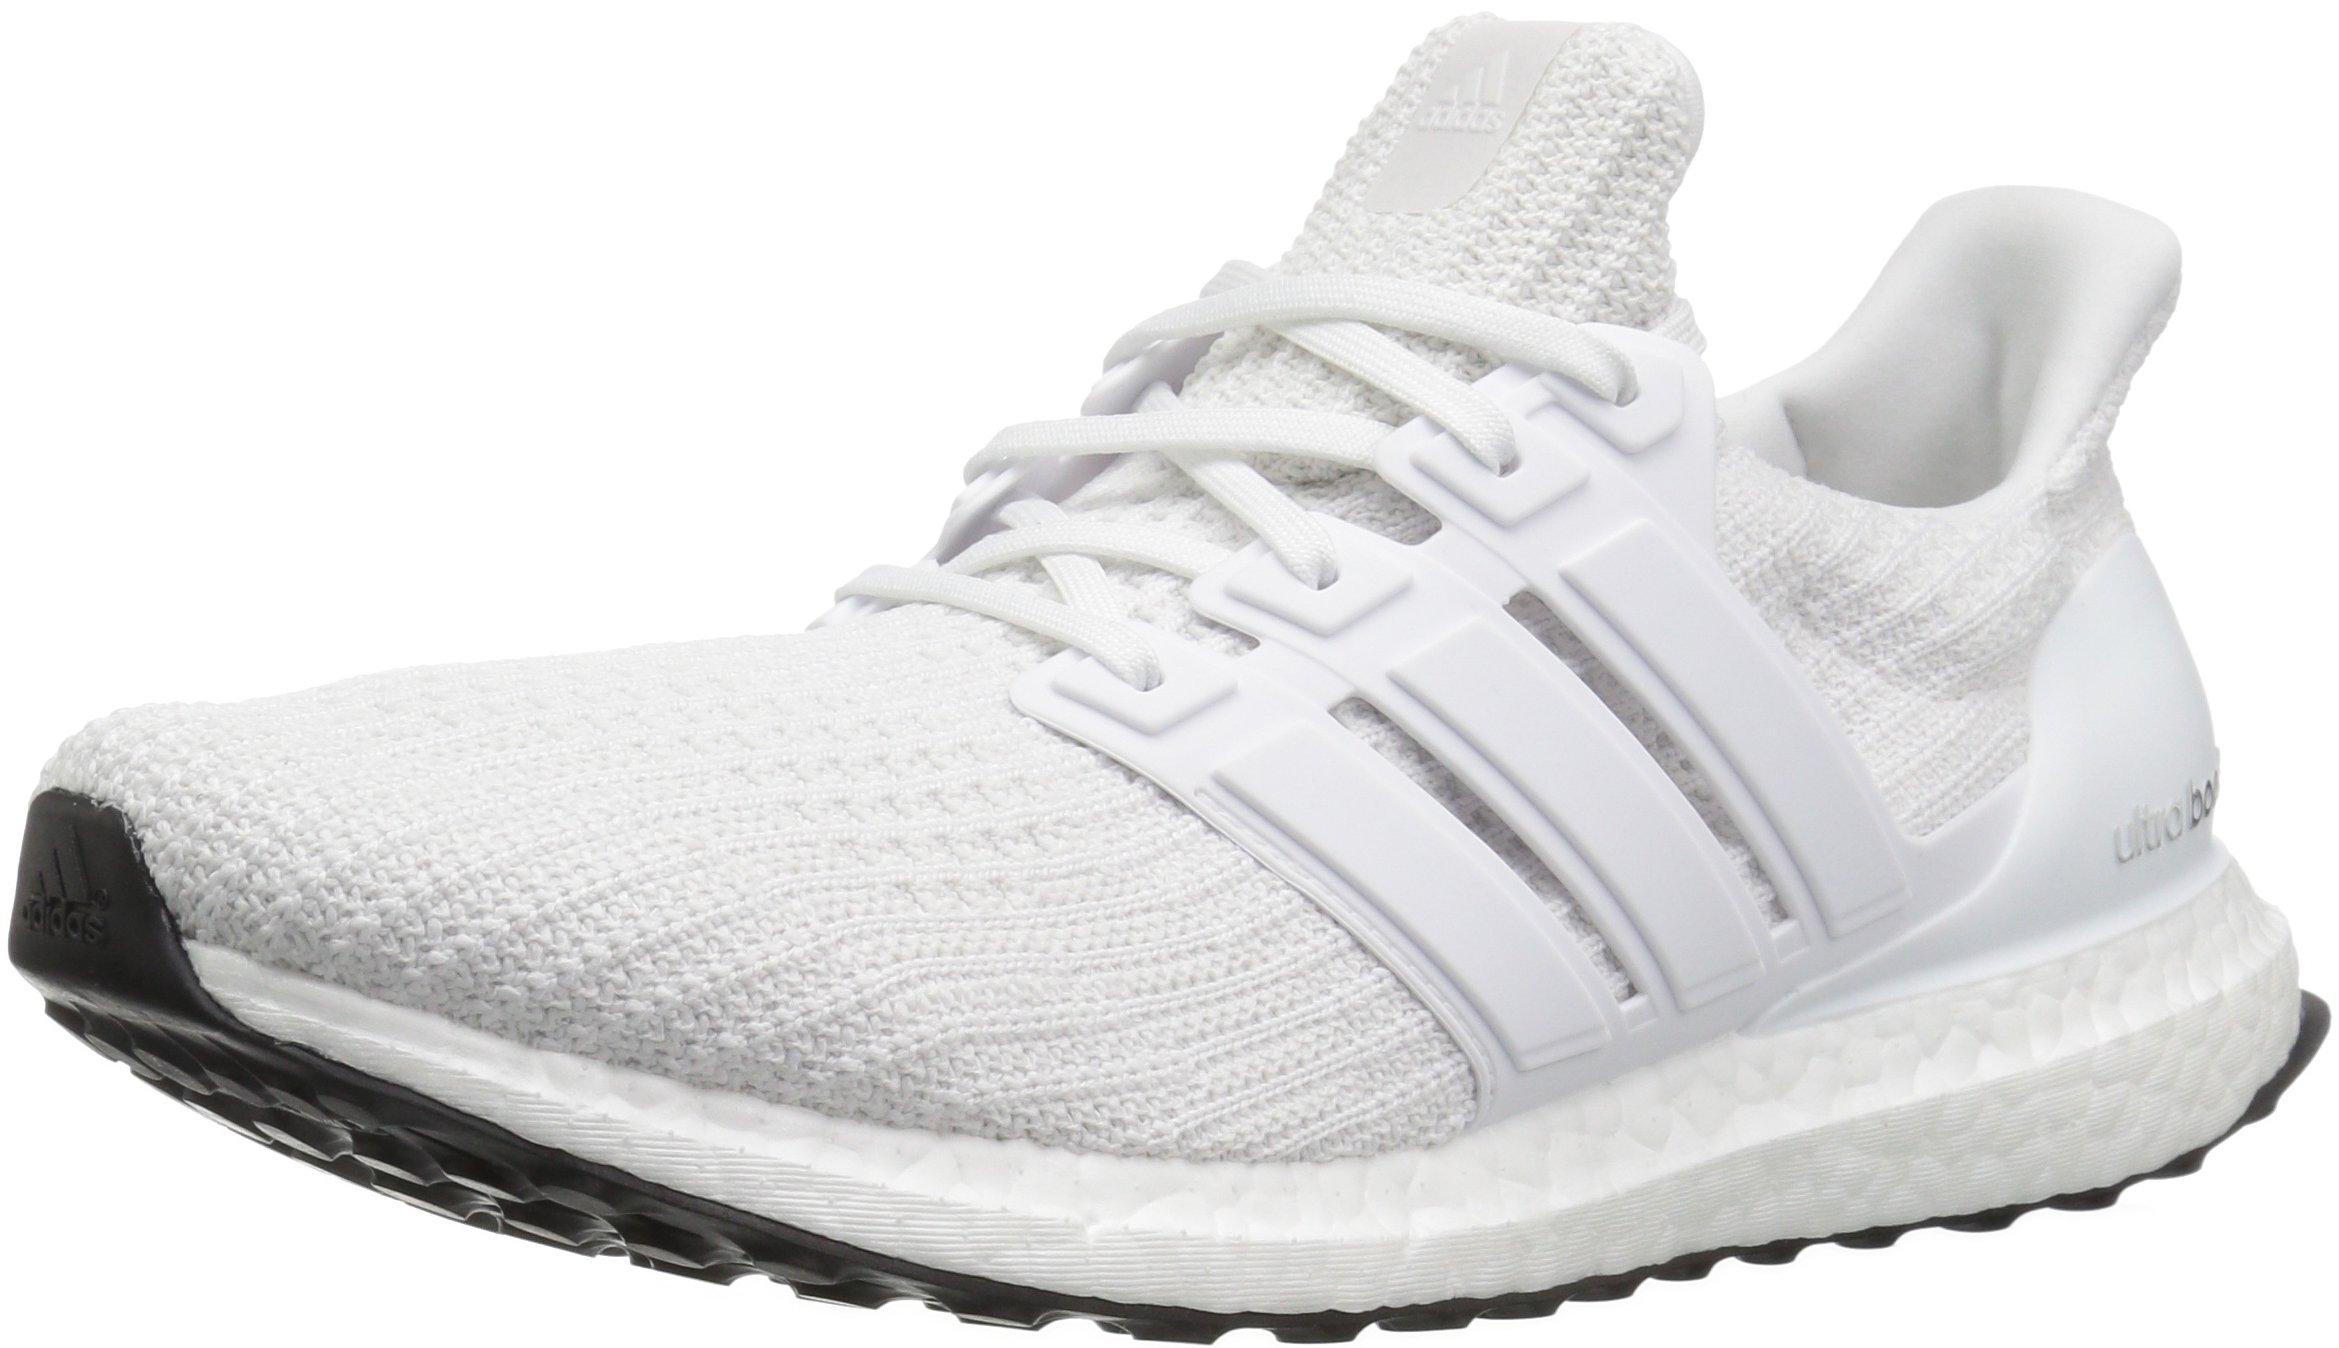 adidas Performance Women's Ultraboost W Running Shoe US 6.5